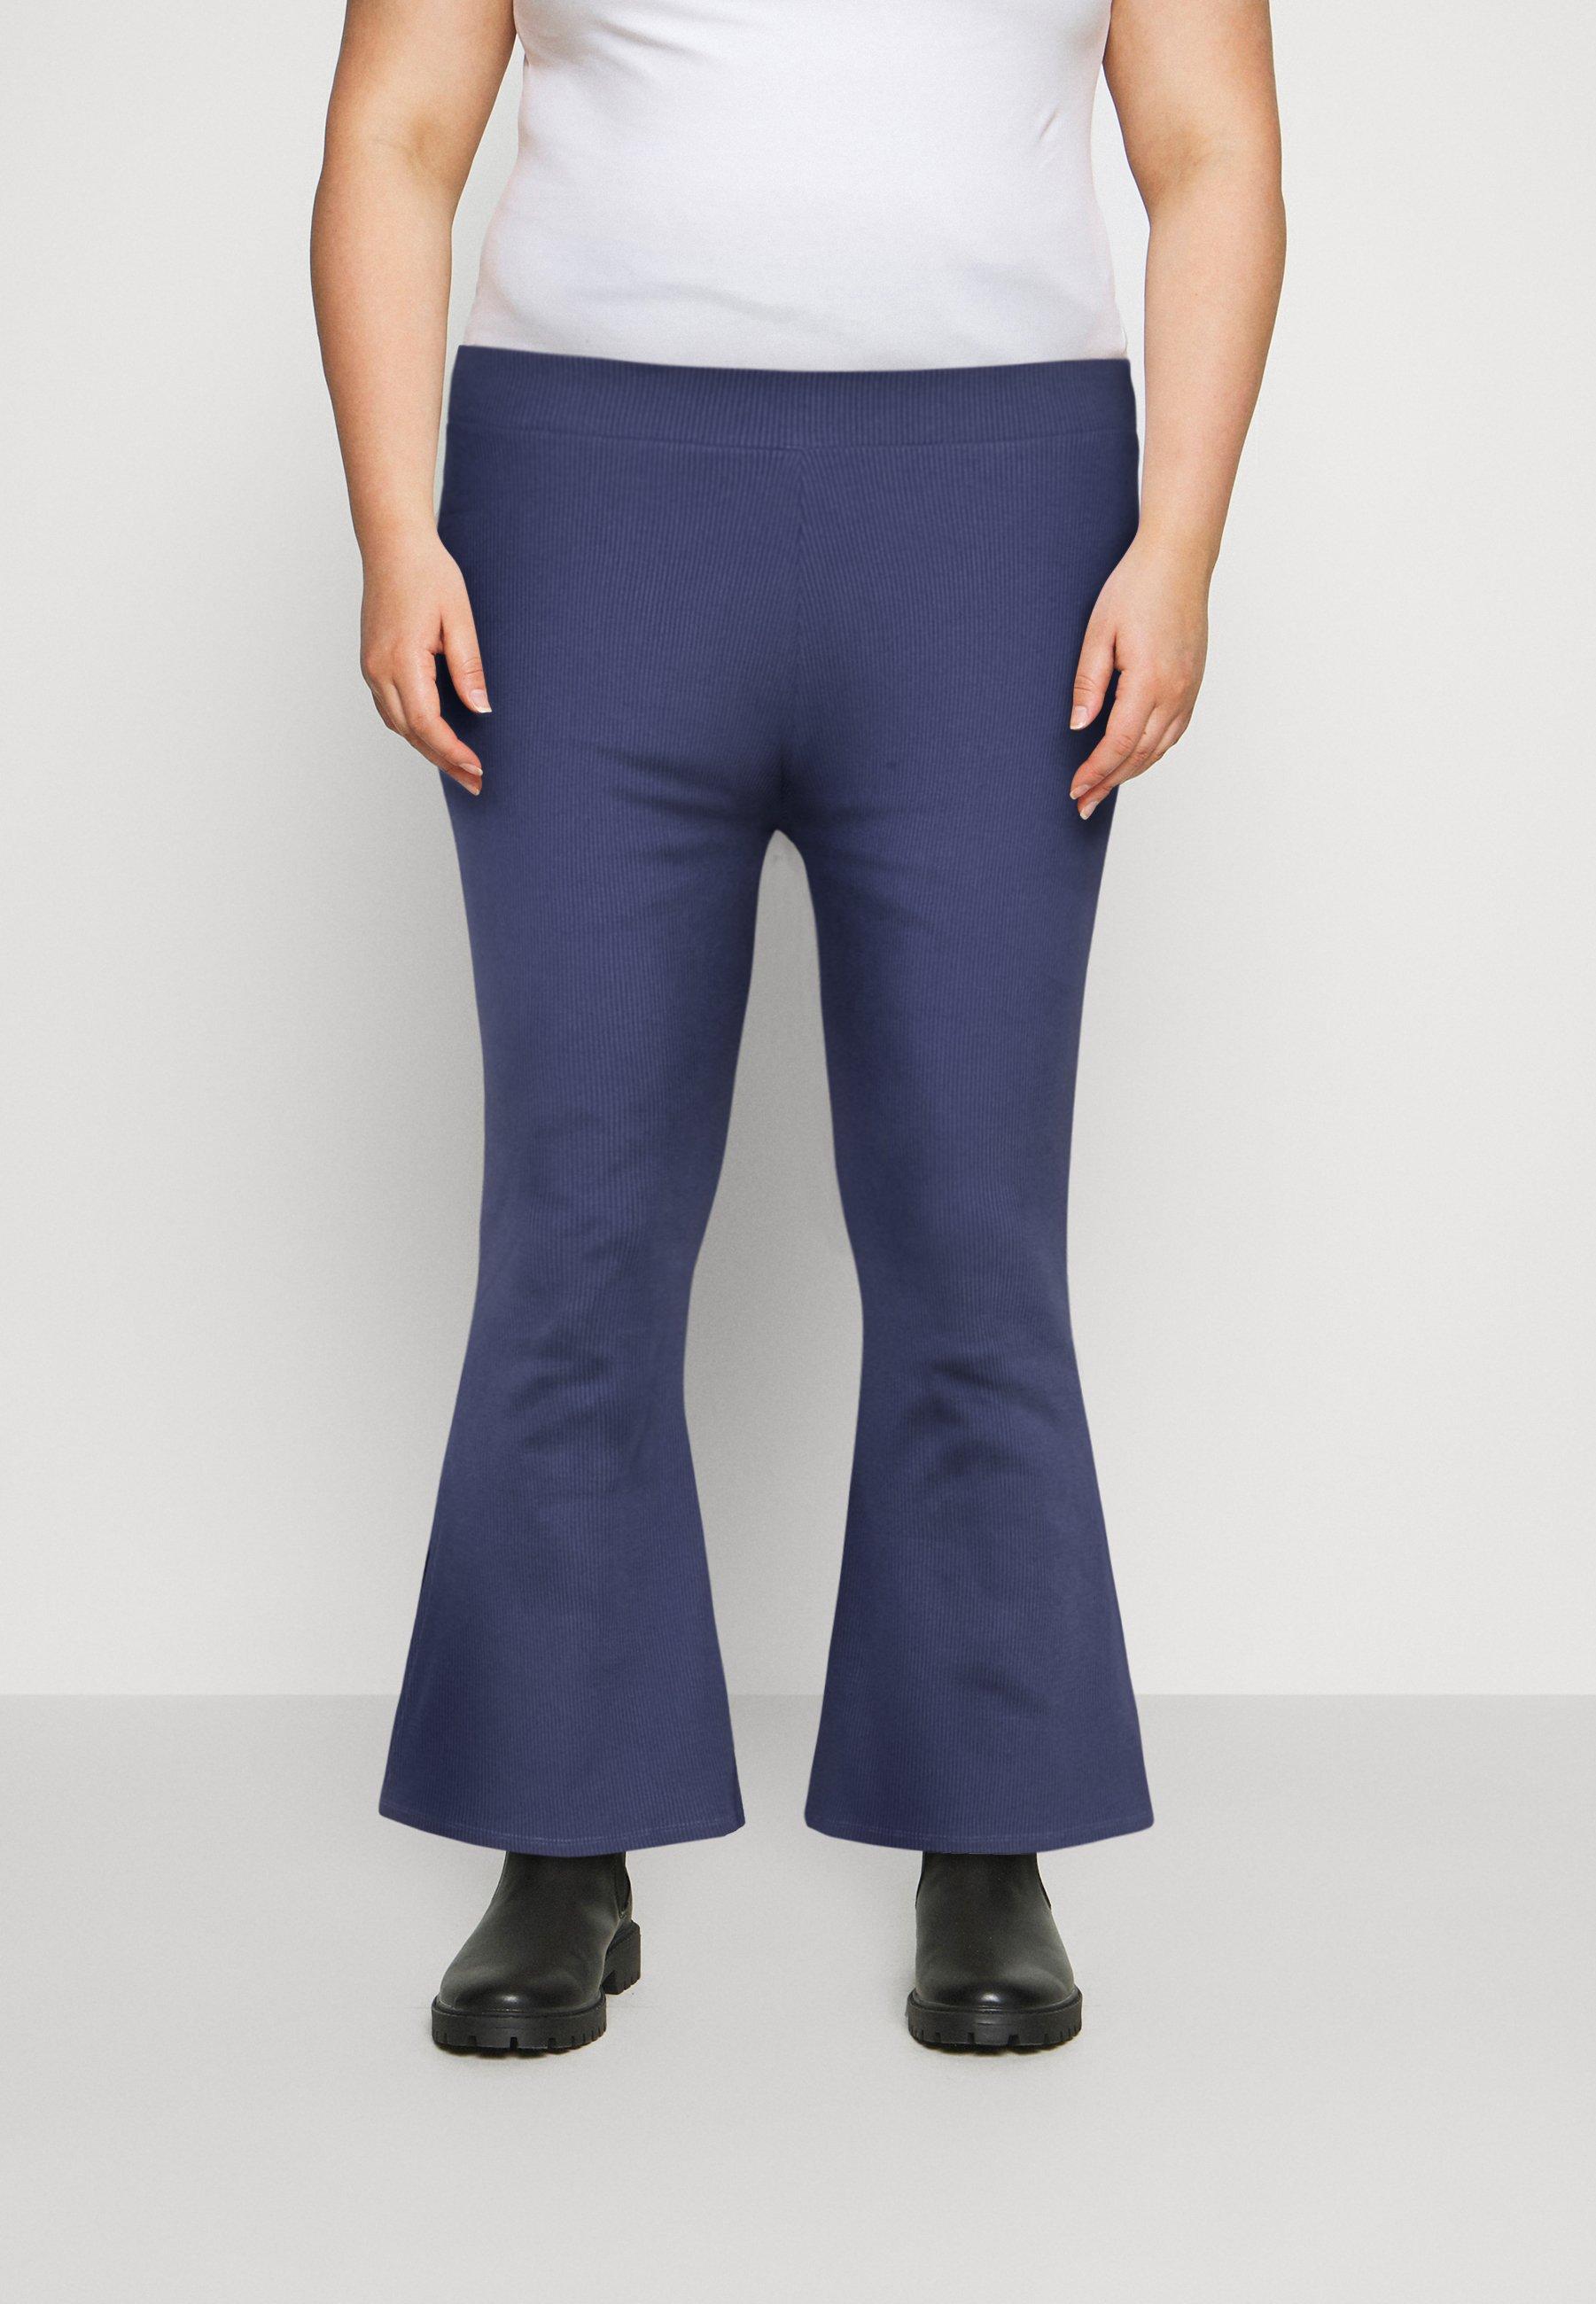 Femme HIGH WAIST FLARE LEGGINGS - Pantalon classique